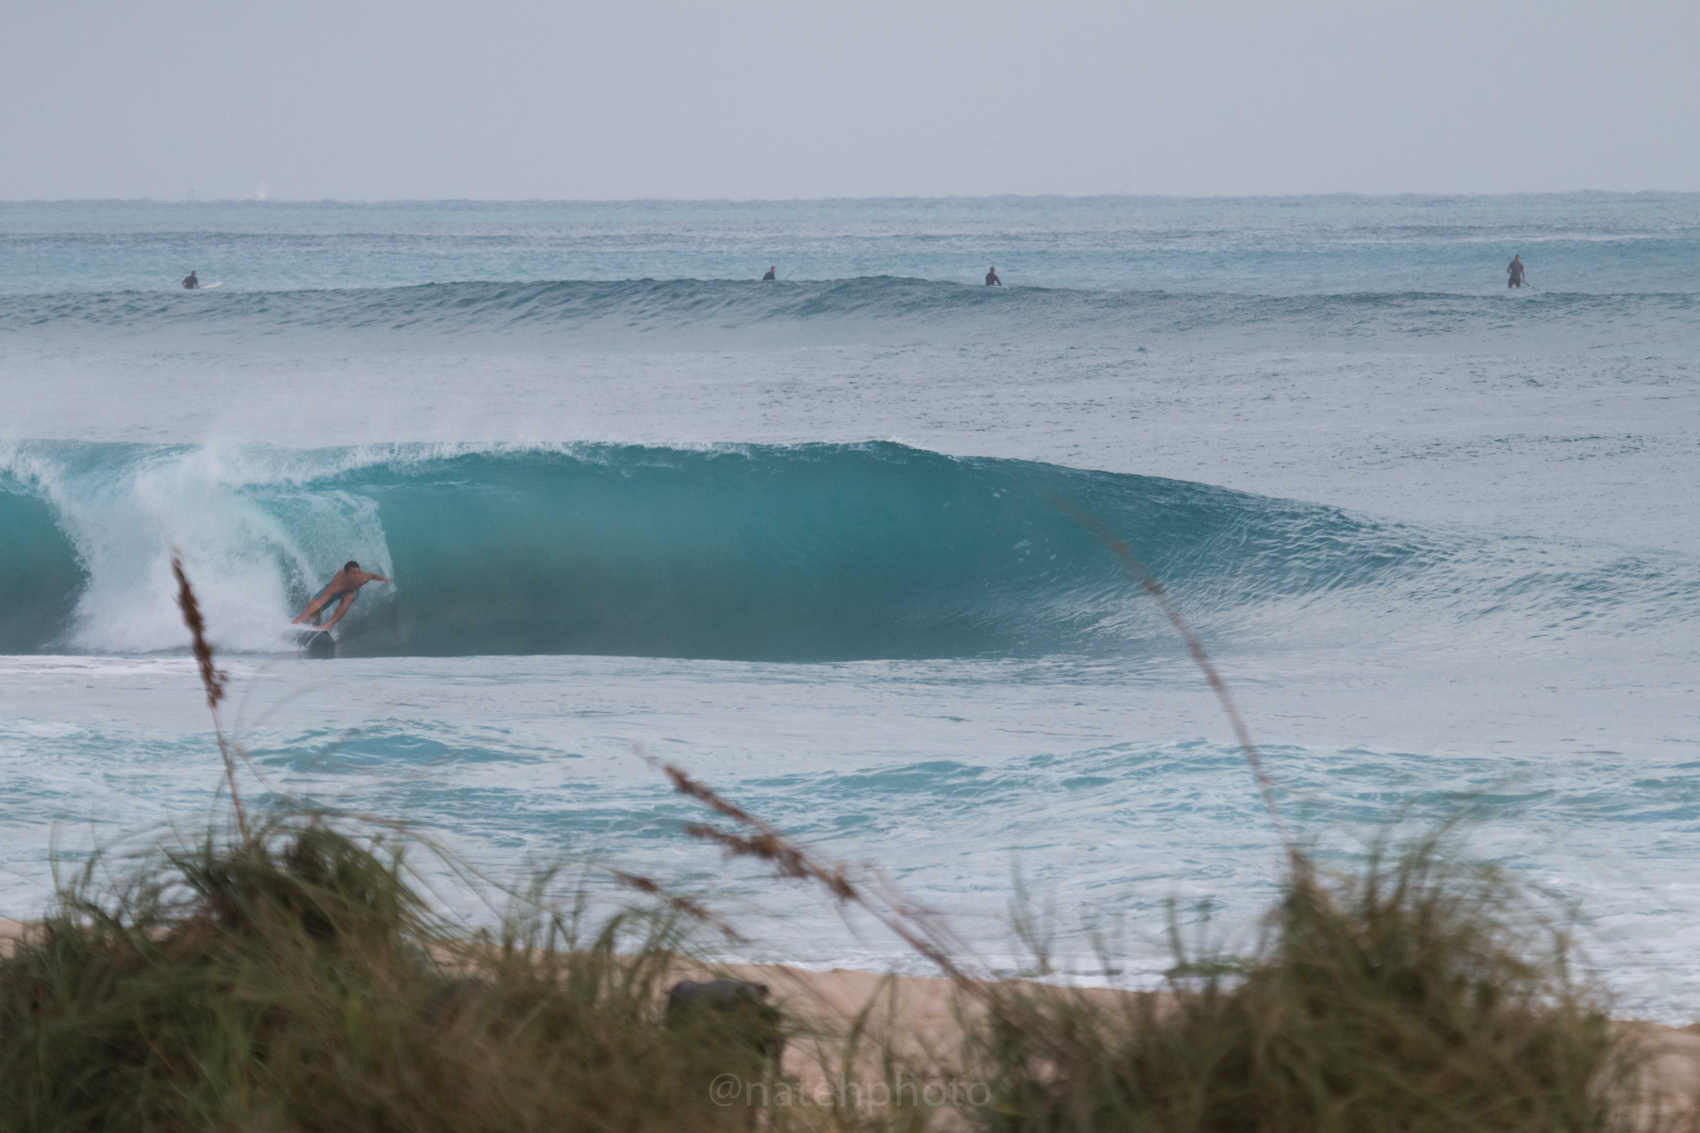 JanuarySwell_ReefRoad_Florida_natehphoto-4159.jpg